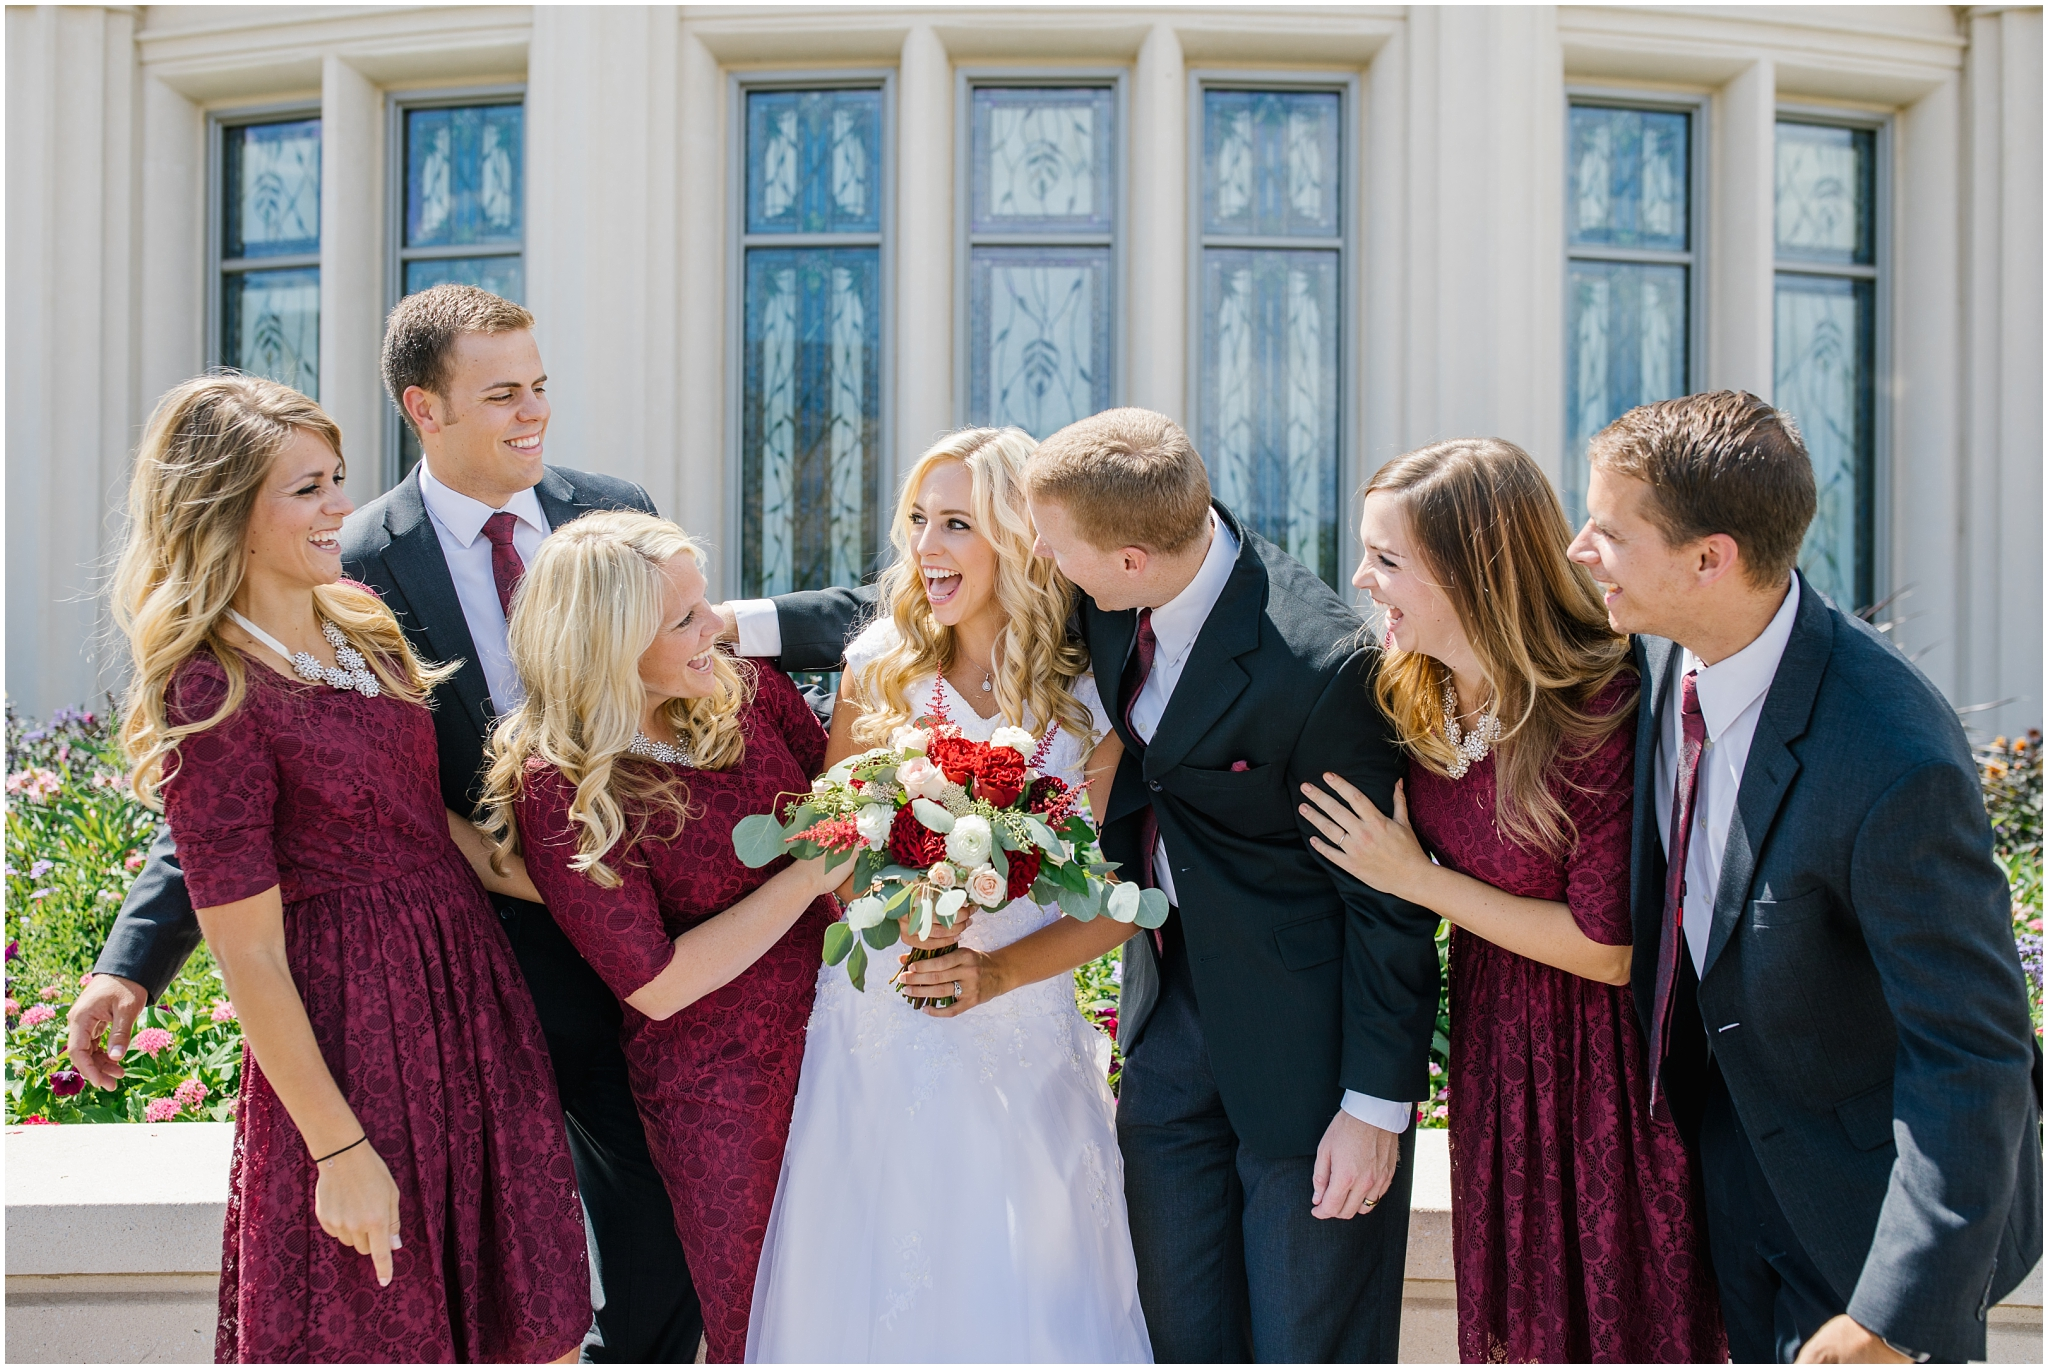 HannahChaseWedding-45_Lizzie-B-Imagery-Utah-Wedding-Photographer-Park-City-Salt-Lake-City-Payson-Temple-Clarion-Garden-Center.jpg